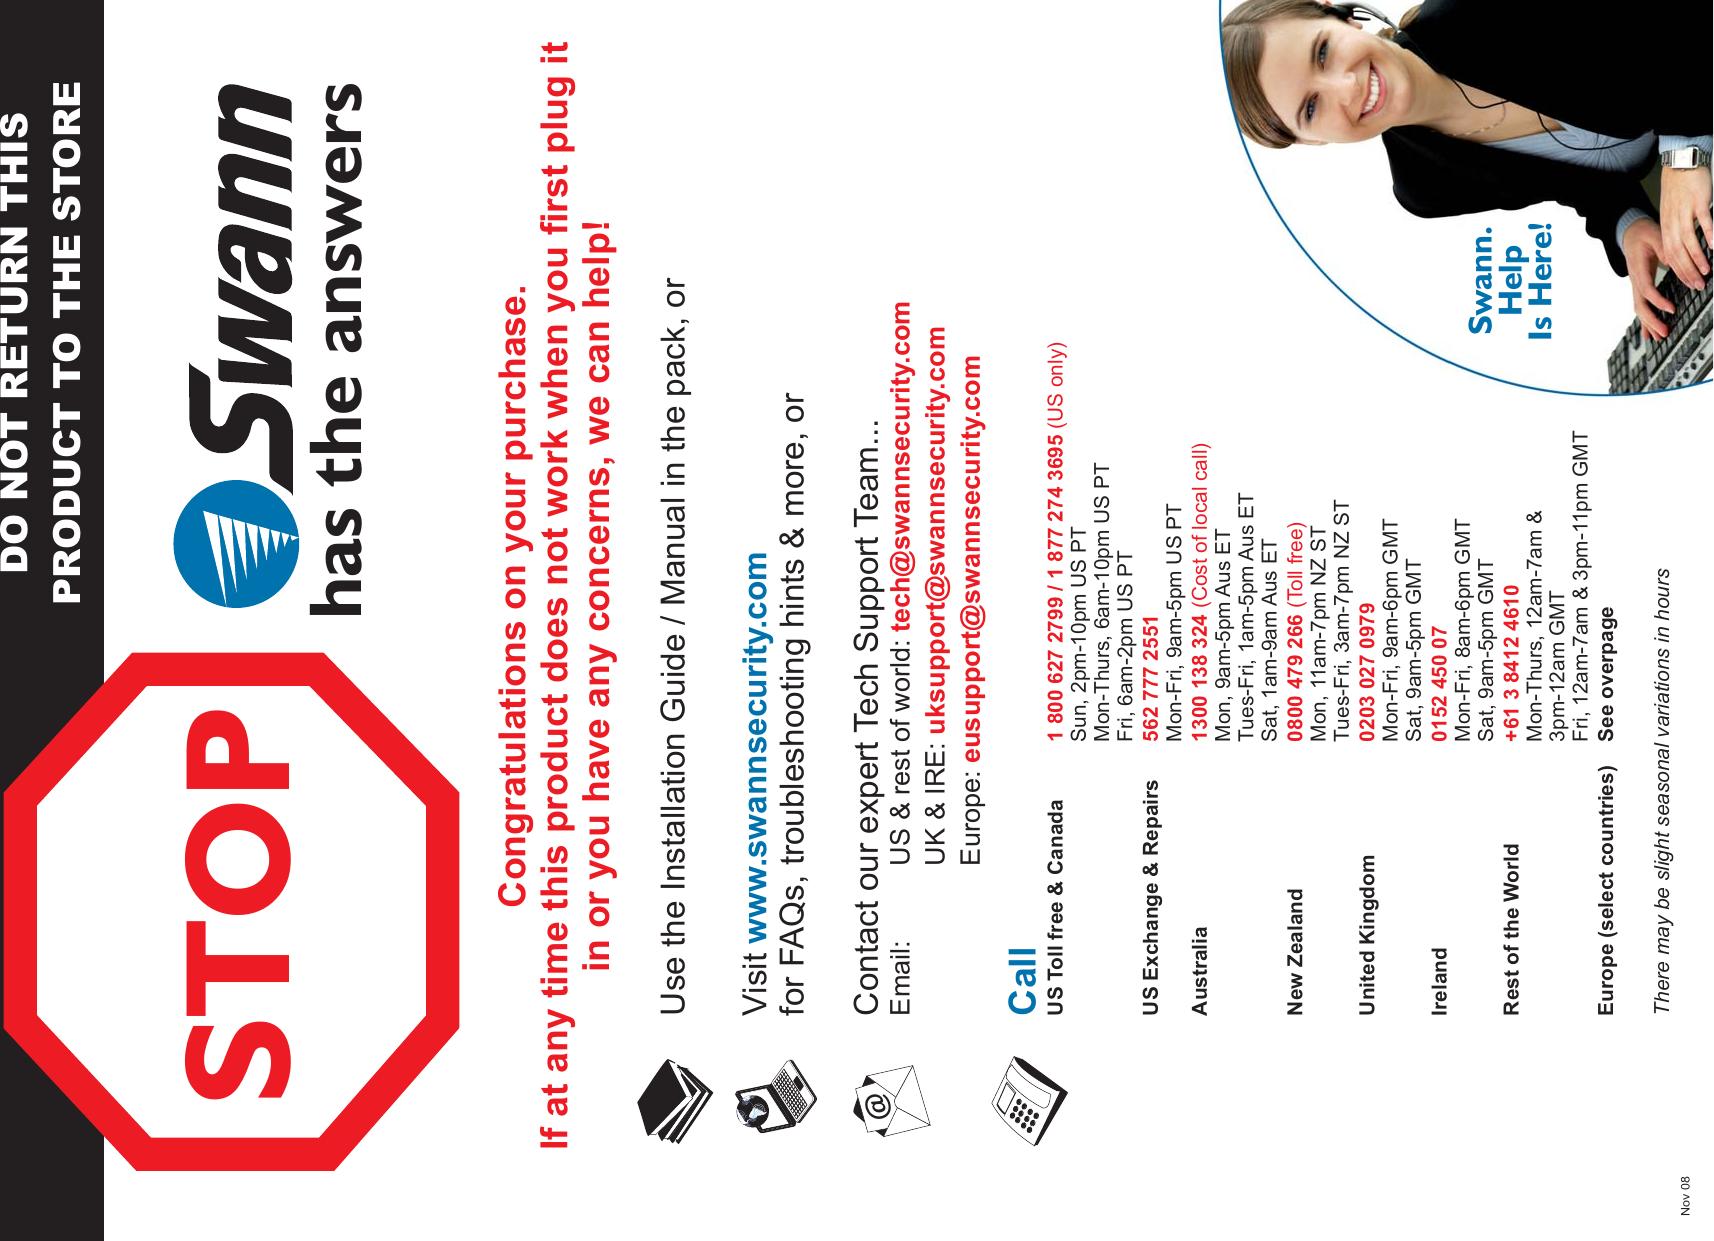 Swann Dvr4 950 Users Manual Sw344_dps_esg290509